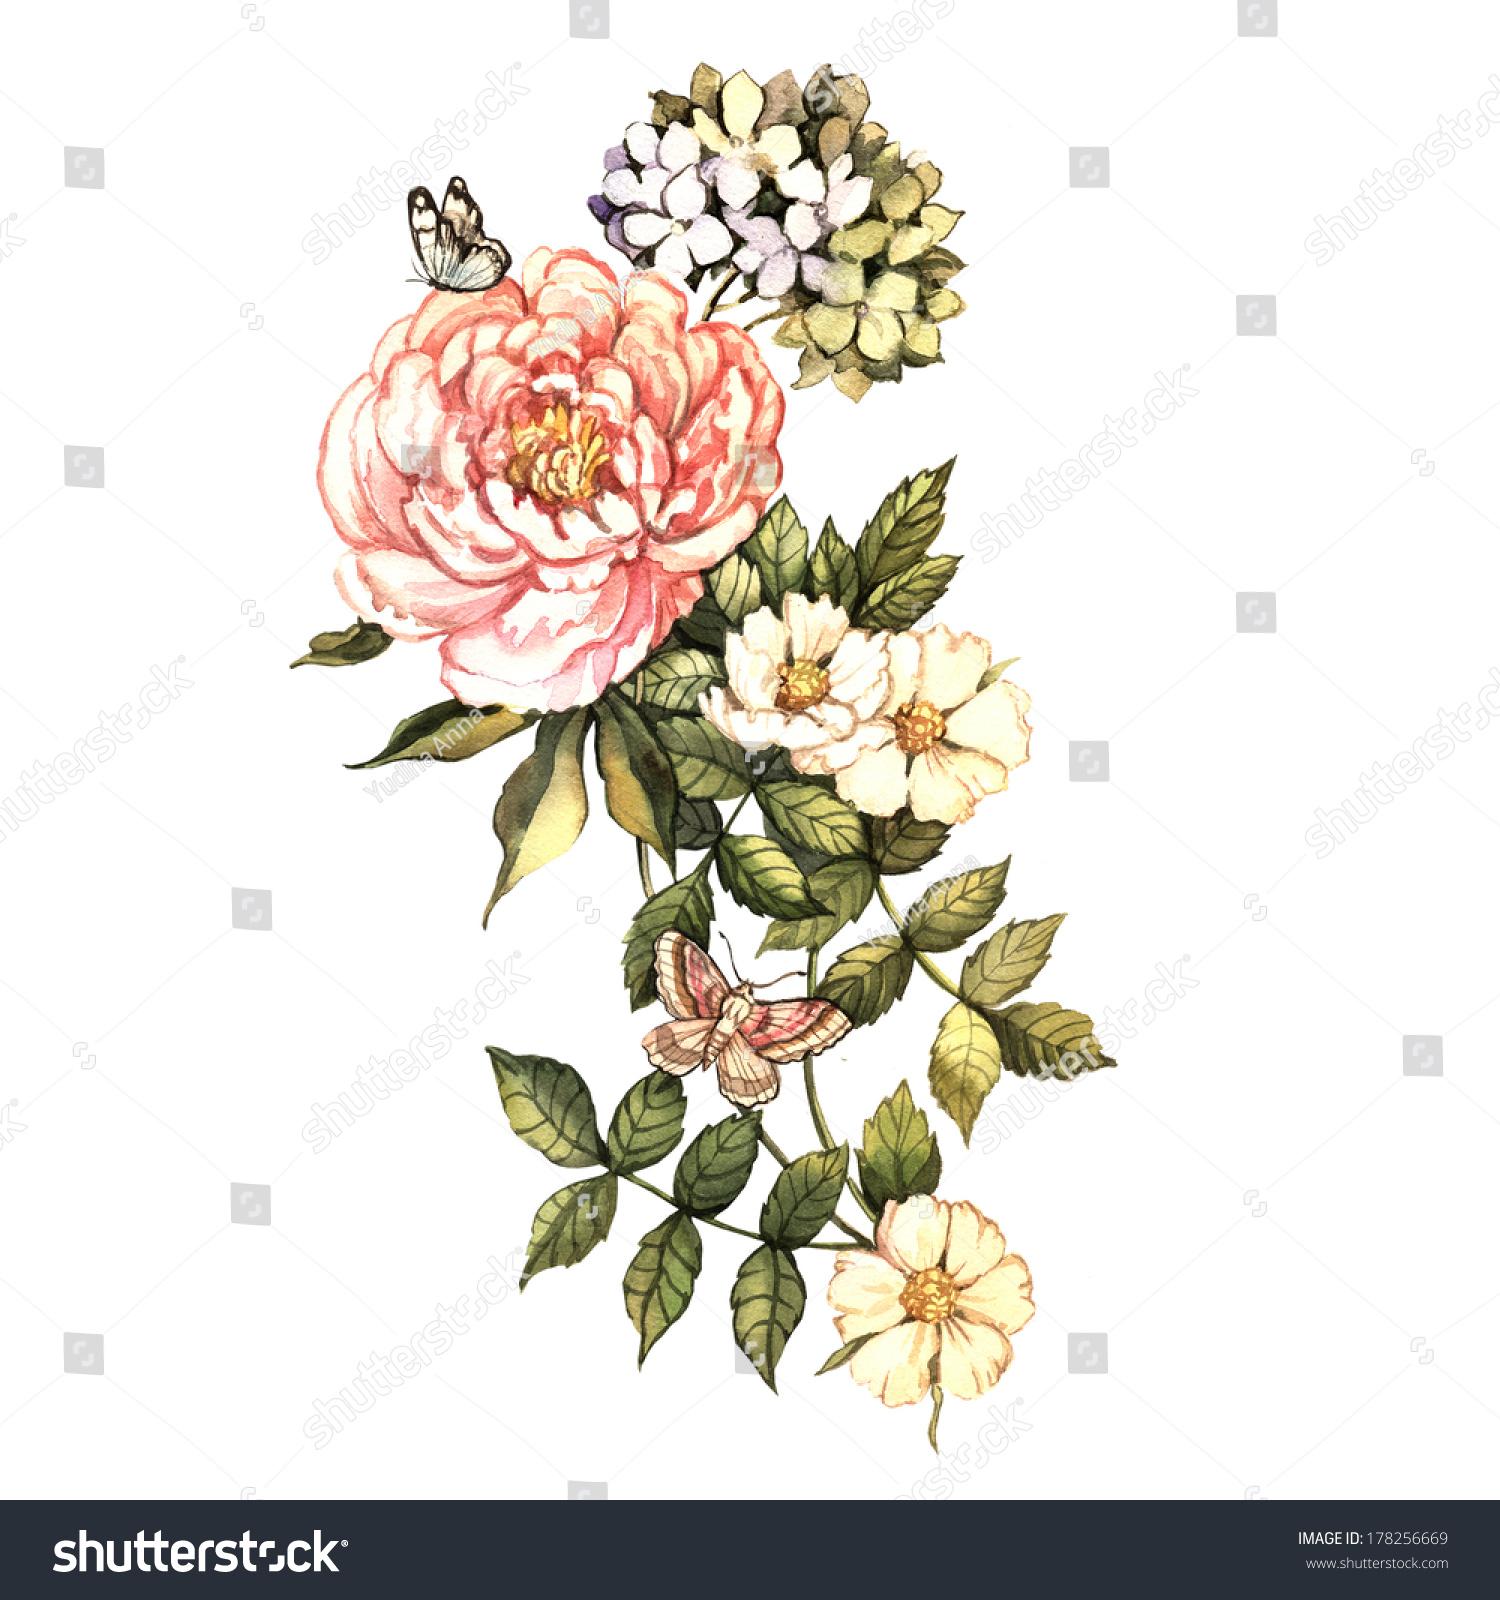 watercolor vintage floral motifs hand painting stock illustration 178256669 shutterstock. Black Bedroom Furniture Sets. Home Design Ideas